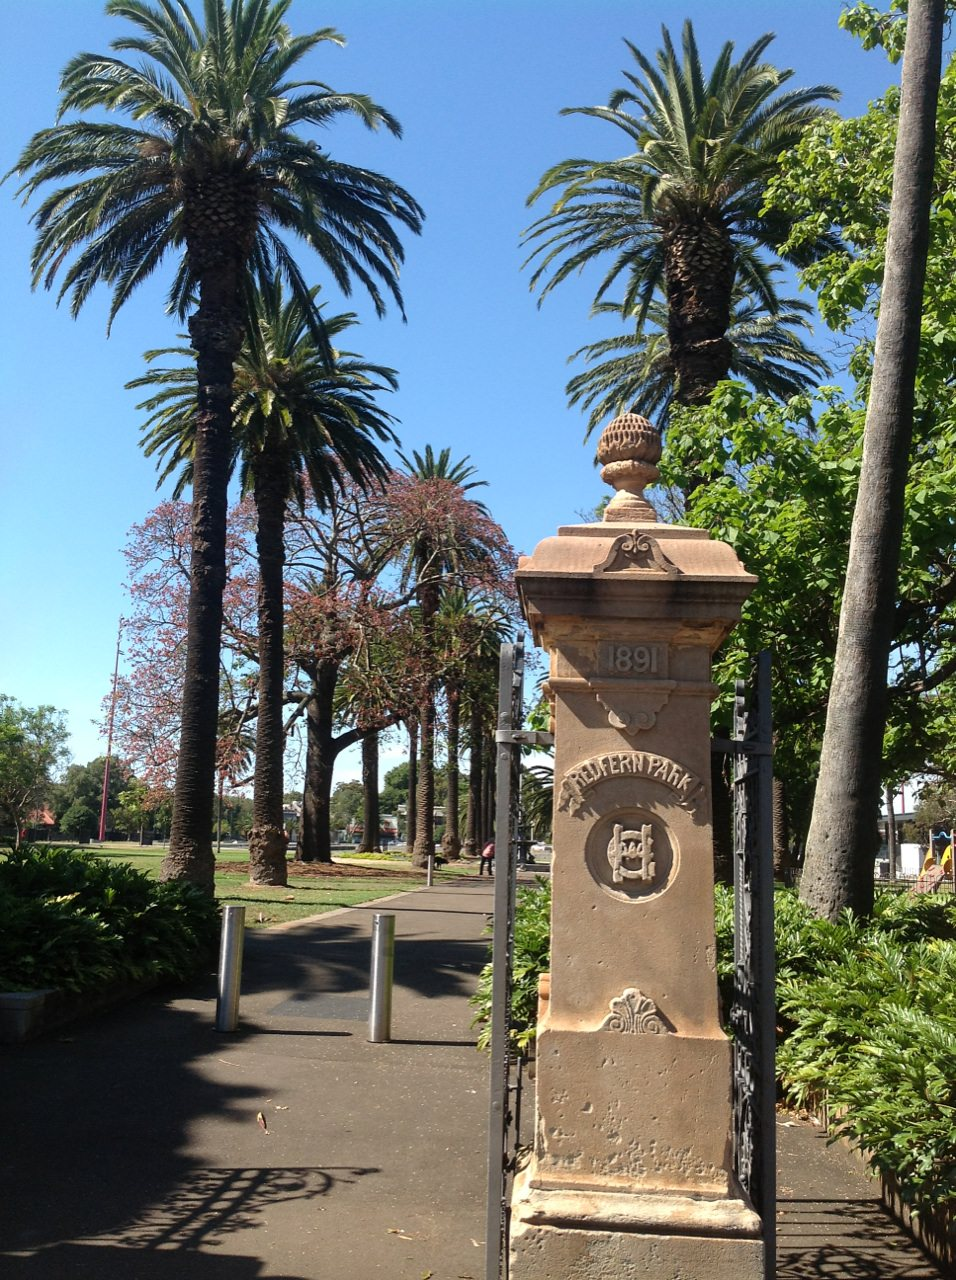 Canary Island Date Palms in Redfern Park